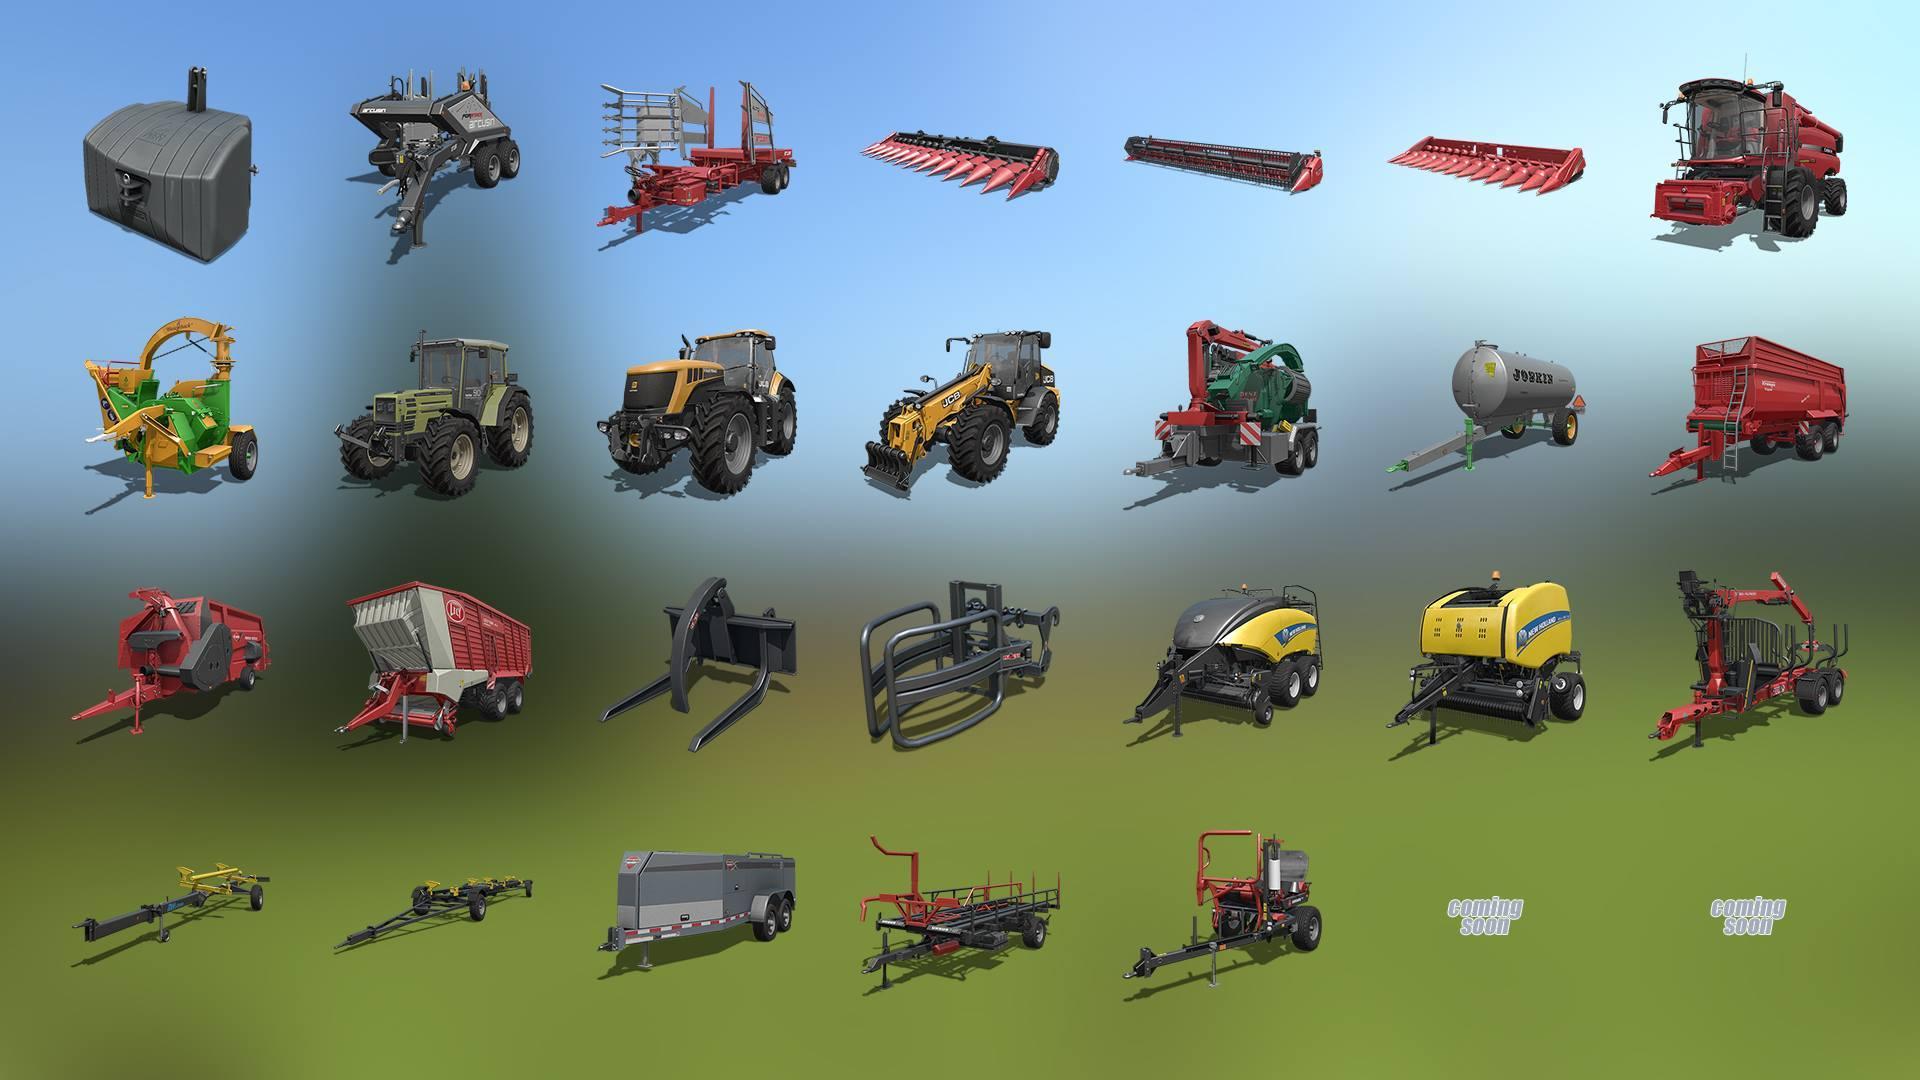 FS 17 new vehicles - Farming simulator 2019 / 2017 / 2015 Mod